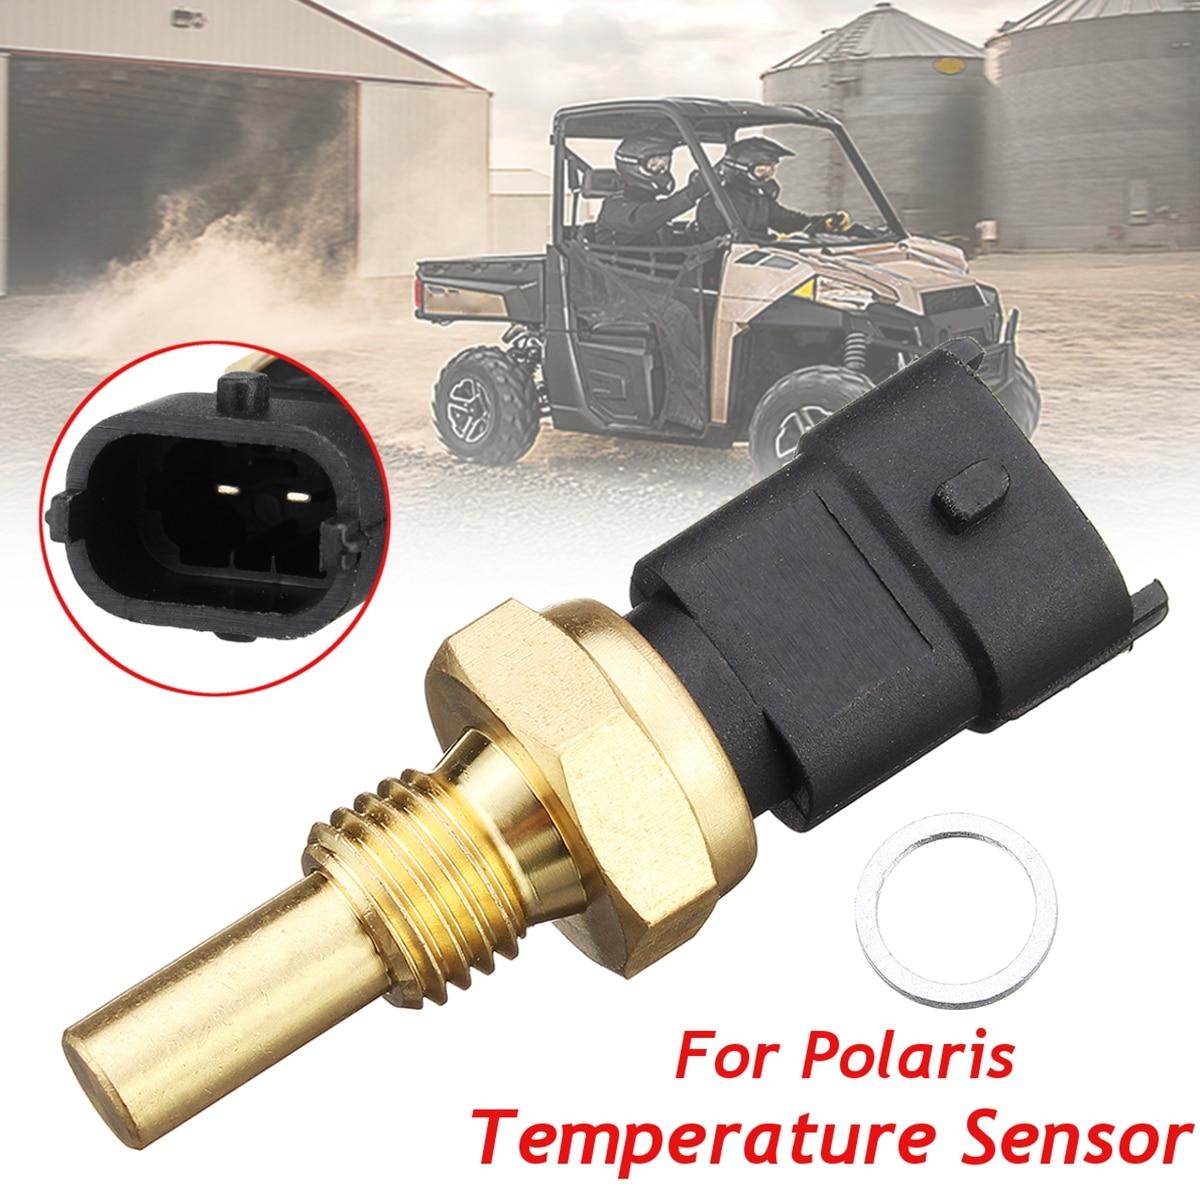 Temperature Sensor Switch For Polaris Sportsman Scrambler 2004 2005 2006 2007 2008 2009 2010 2011 2012 2013 20142017 4010644